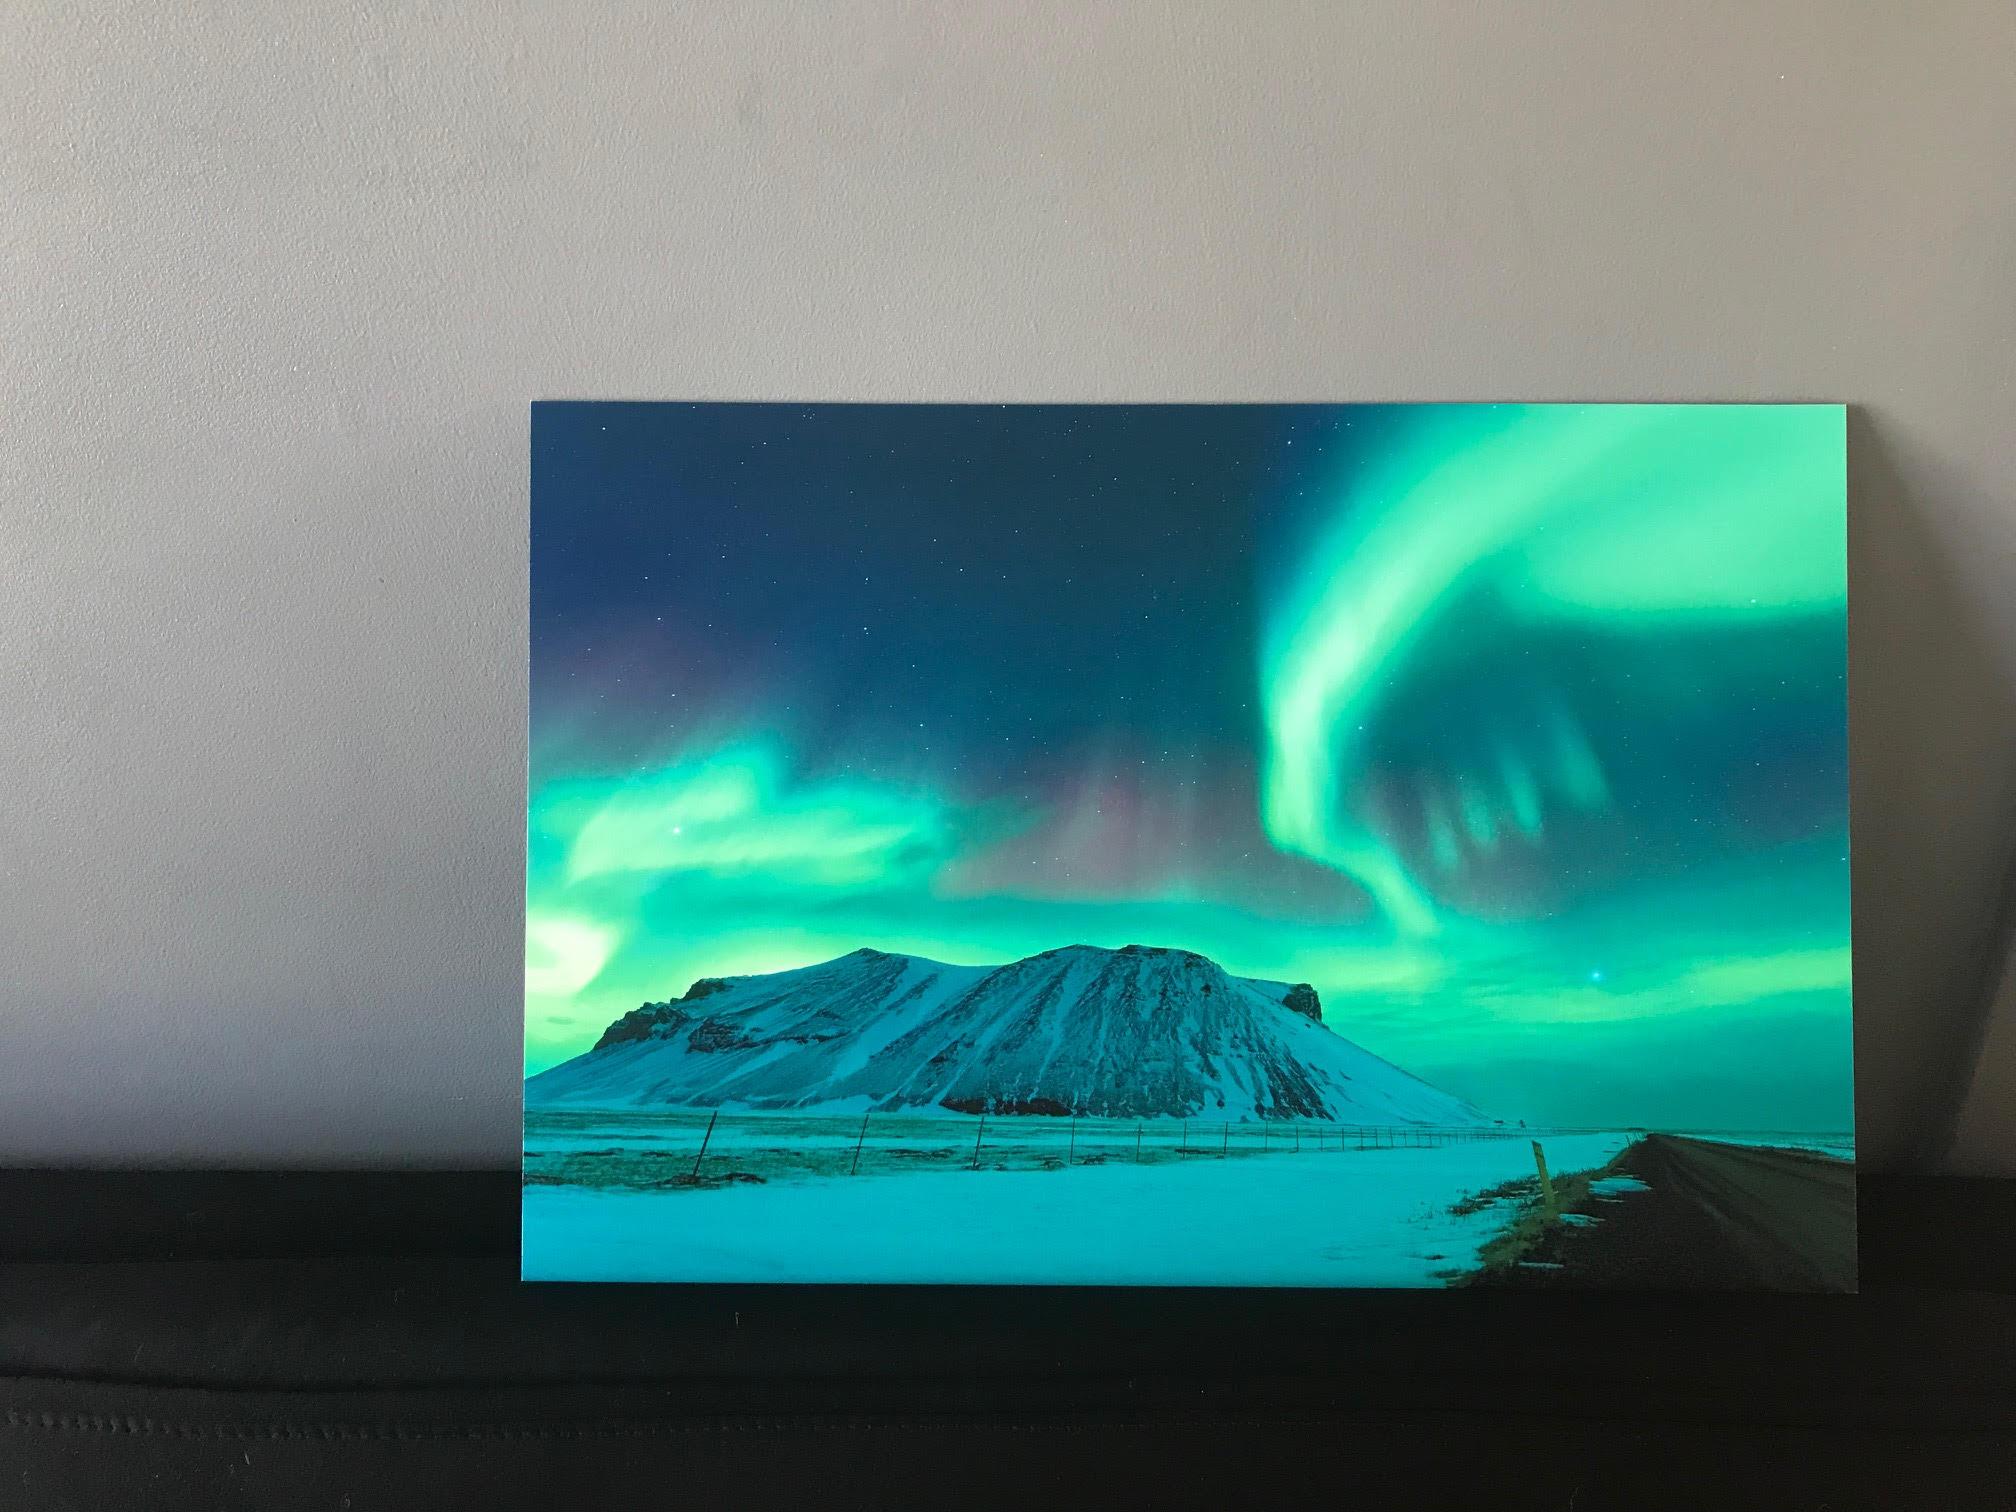 Tirage d'art - Mickaël Bonnami Photographe - Islande - Aurore boréale